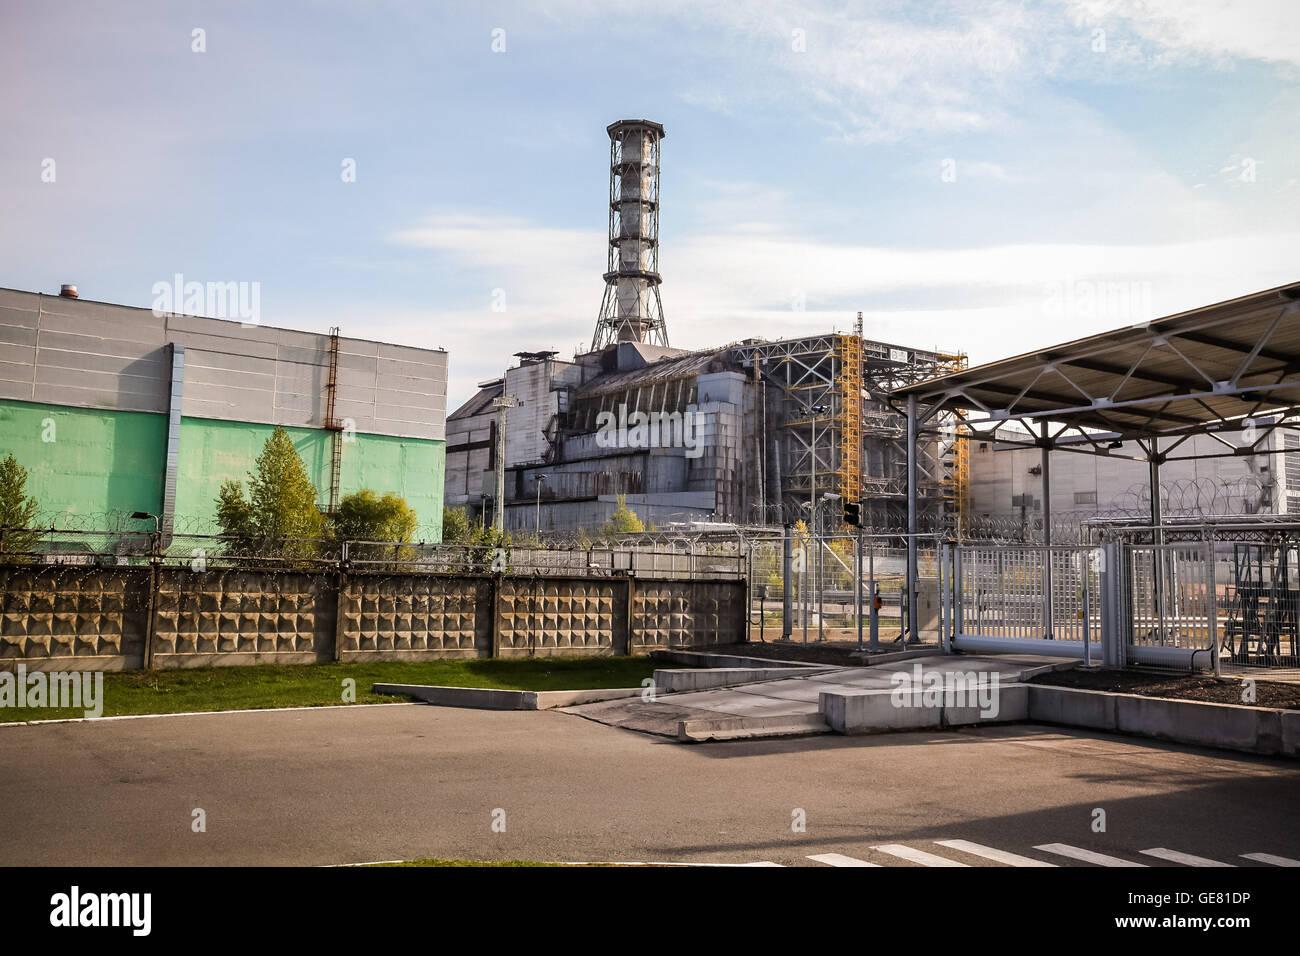 Chernobyl reactor #4 inside the exclusion zone, Ukraine. - Stock Image